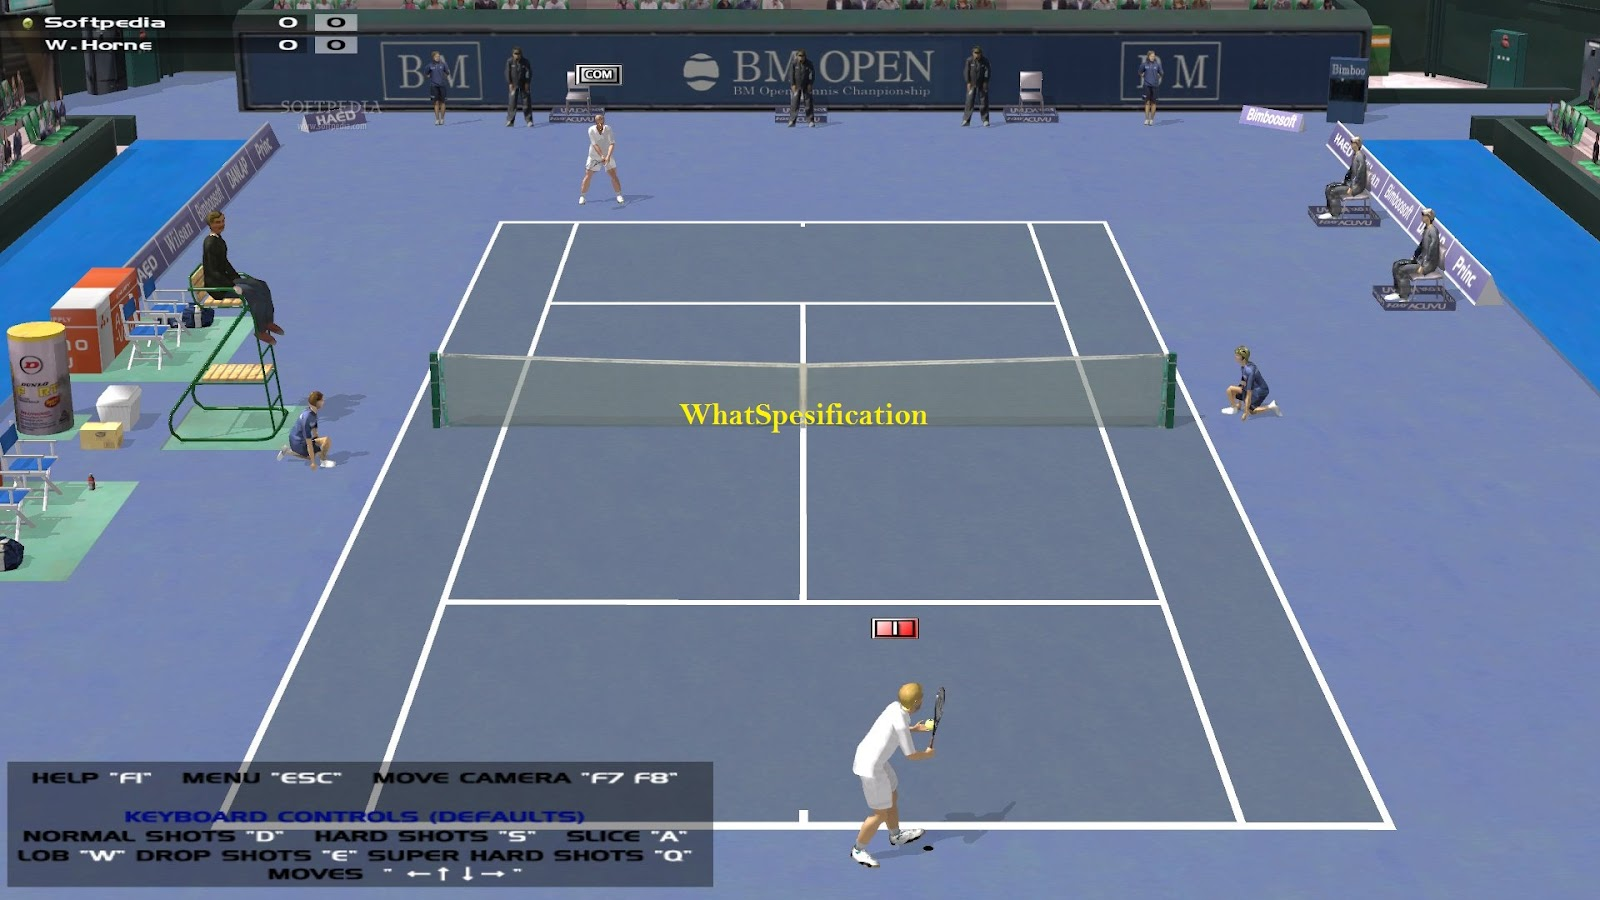 Giochi tennis online